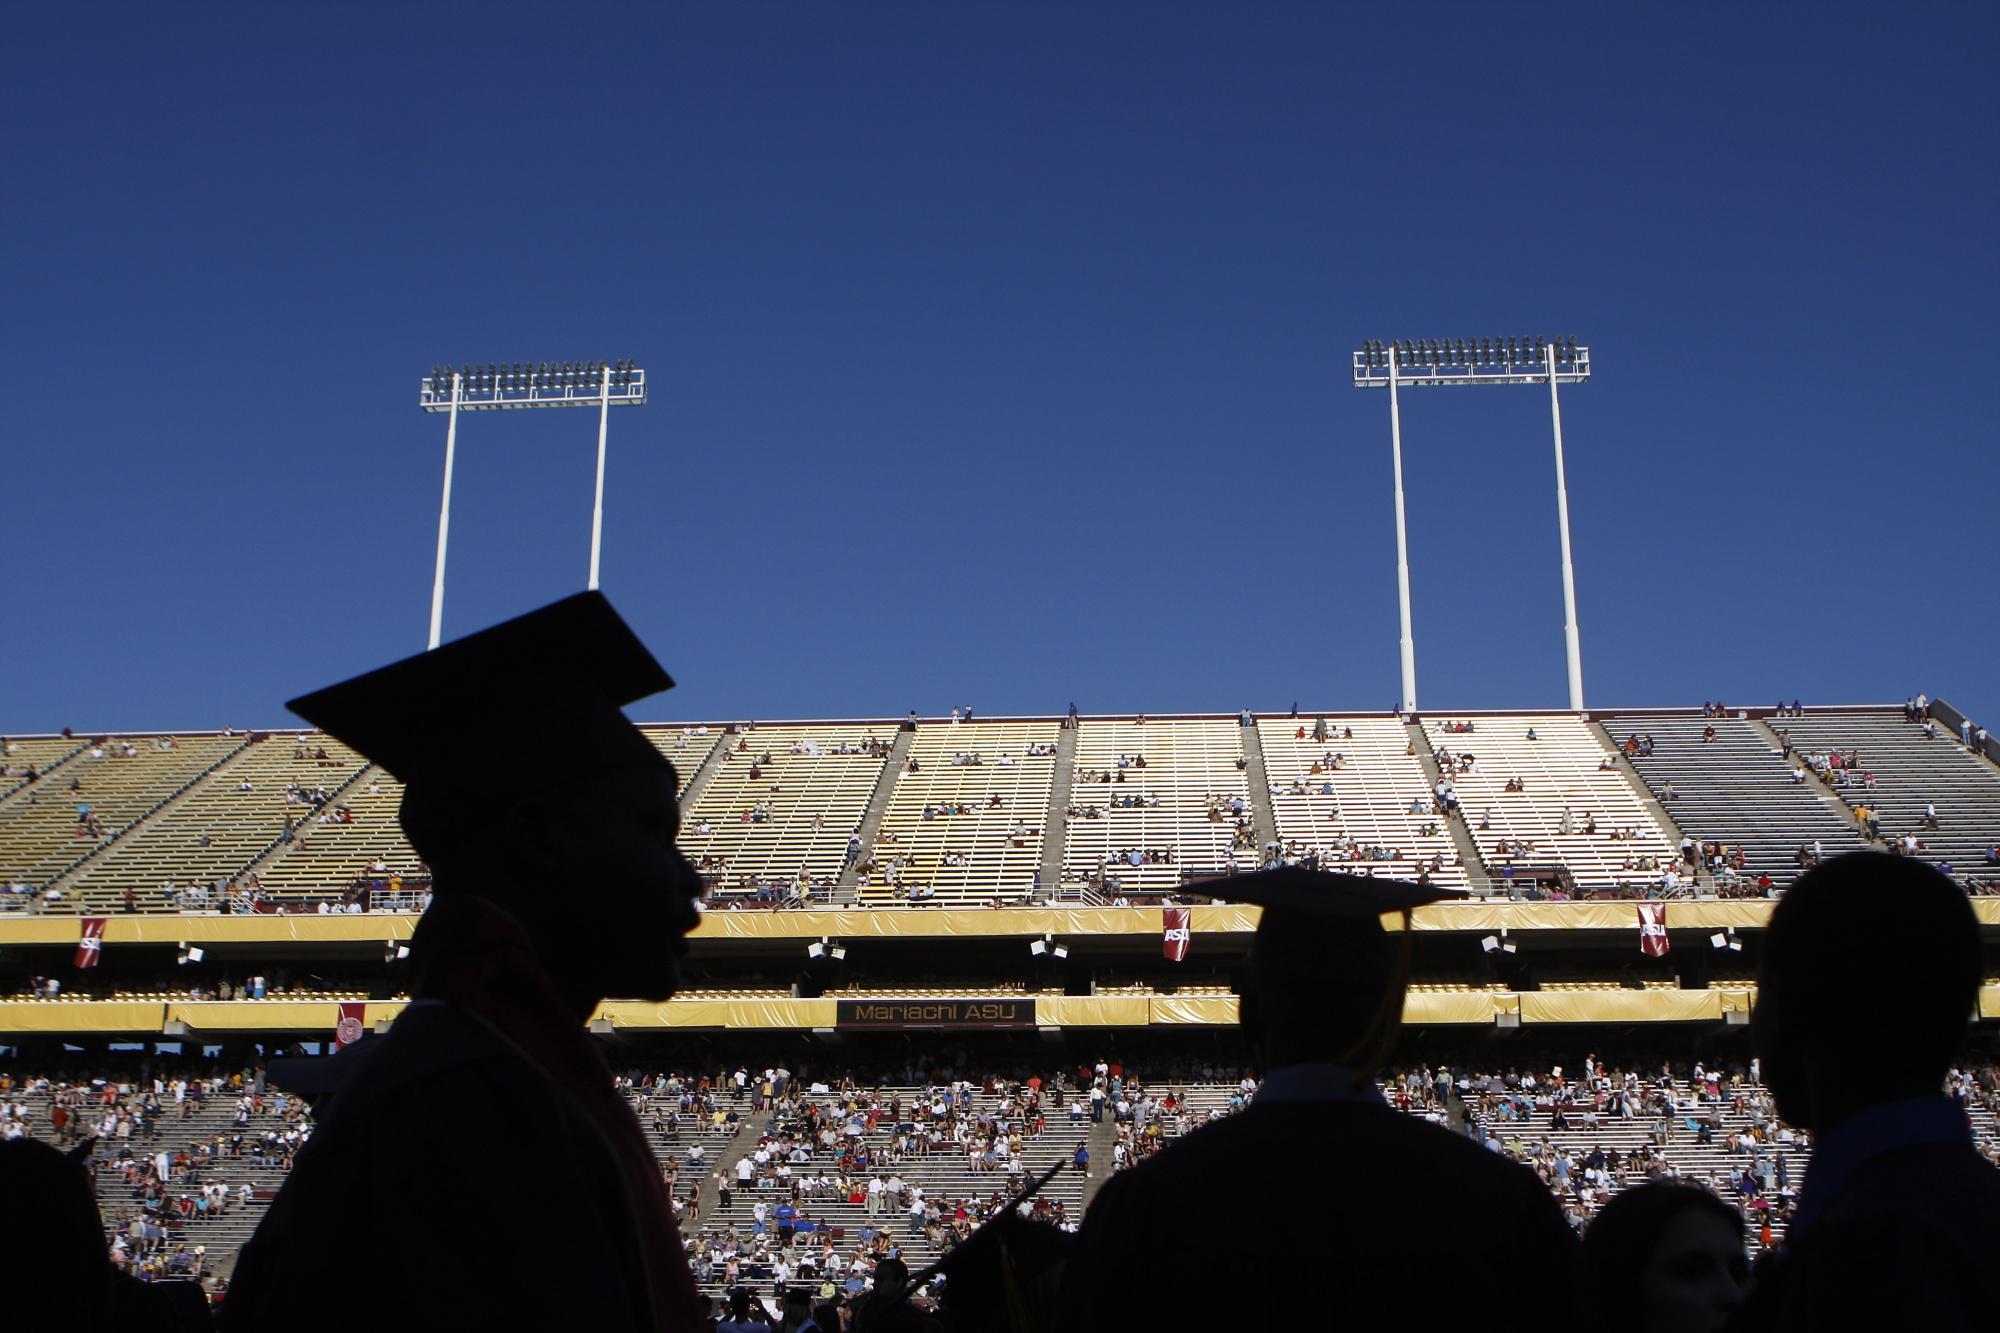 Canceling Student Debt Would Hurt Economy, NABE Survey Shows